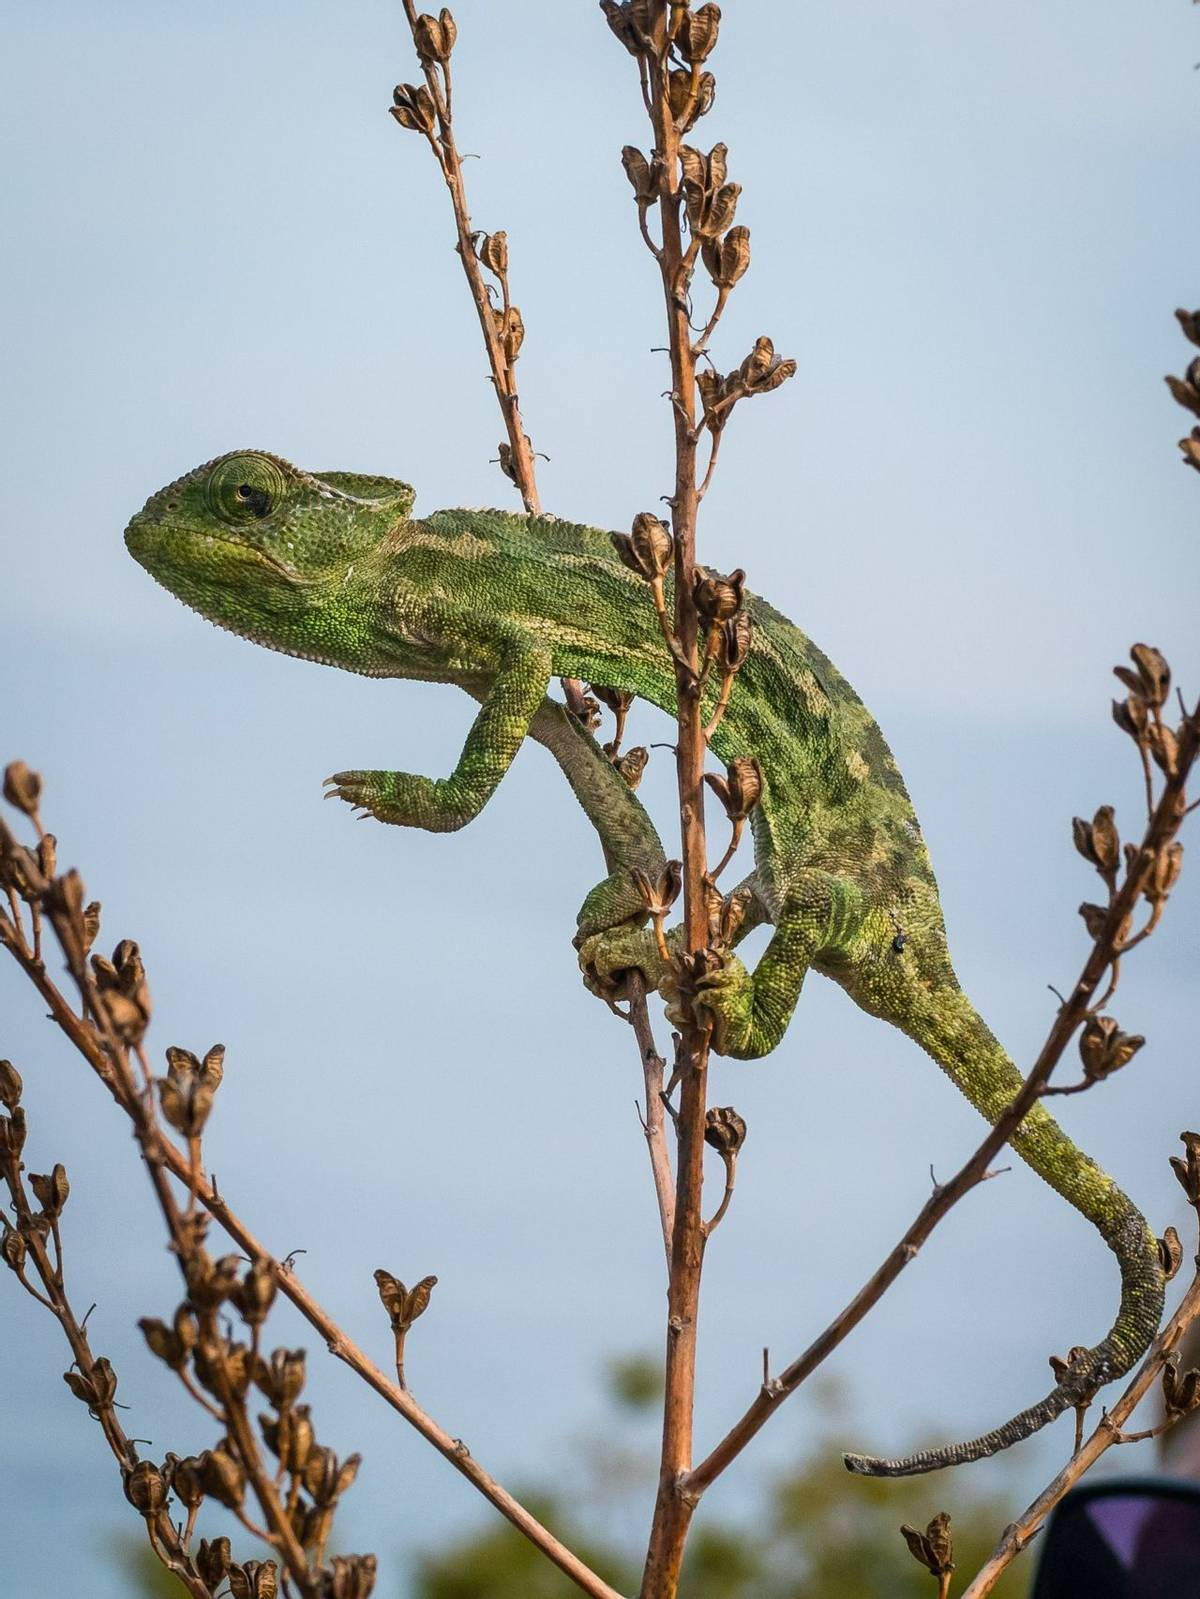 Mediterranean chameleon (Lisa Williamson)